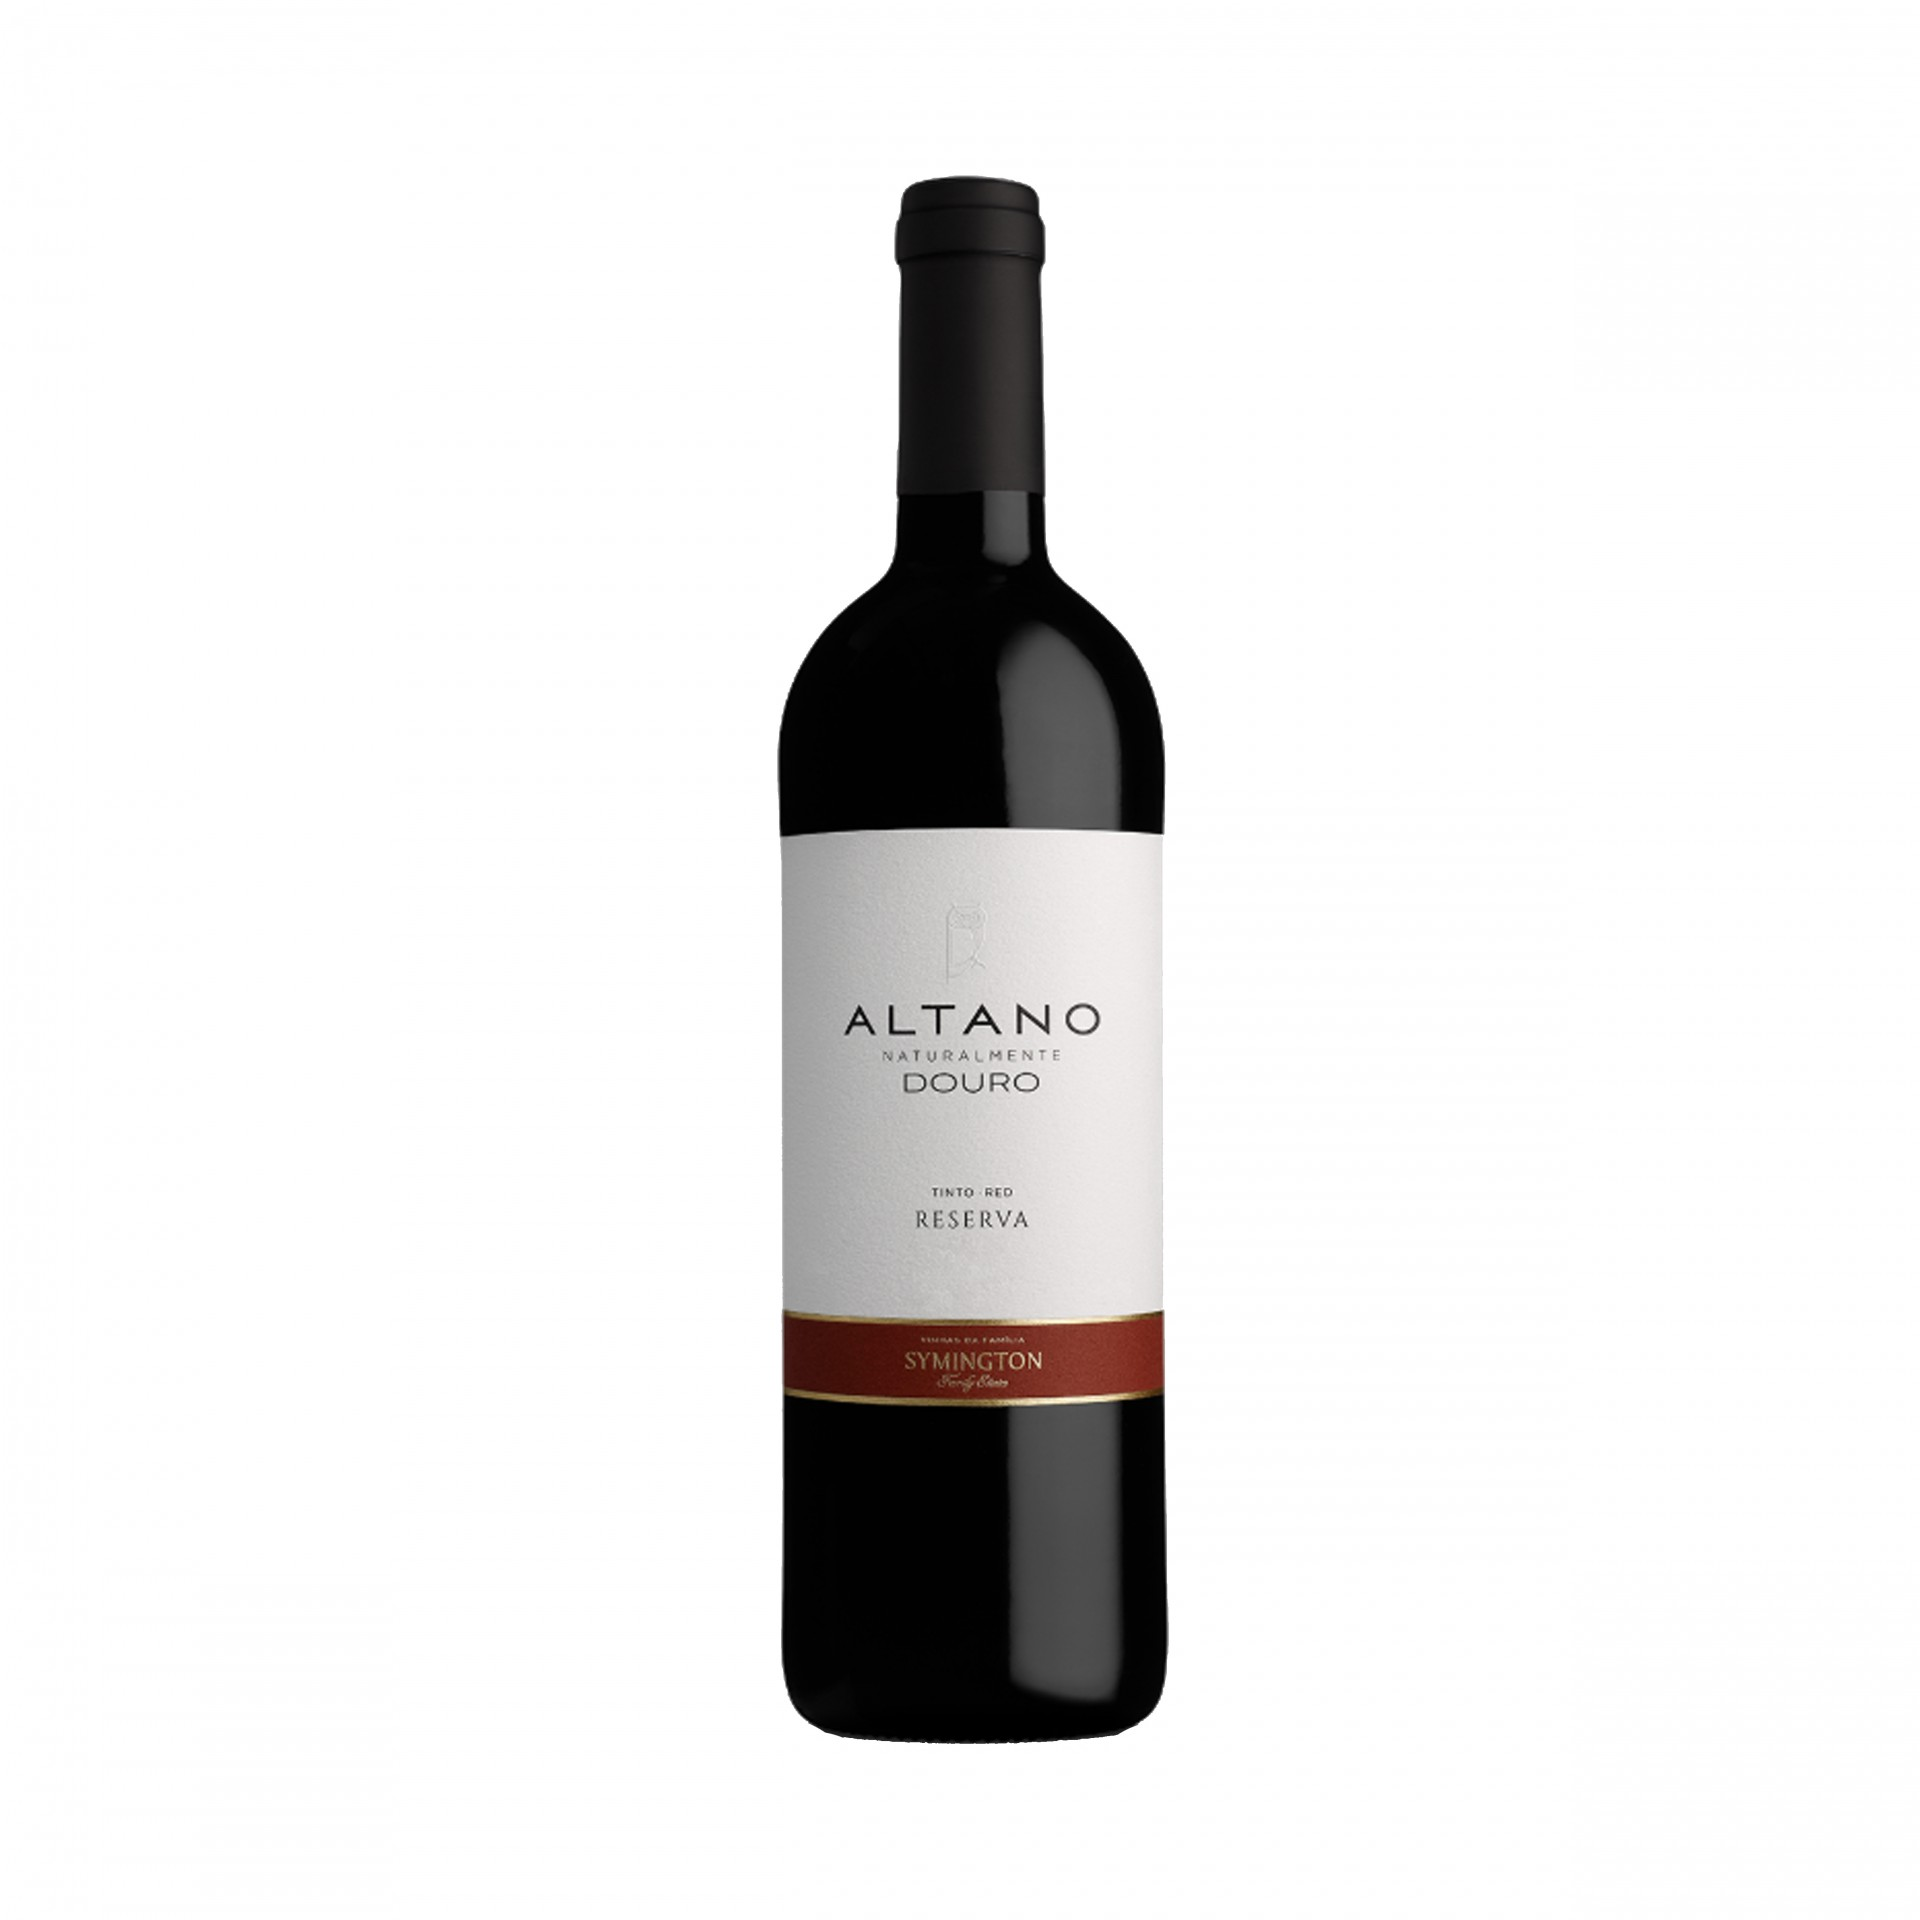 Altano Reserva 2015 Vinho Tinto Douro DOC